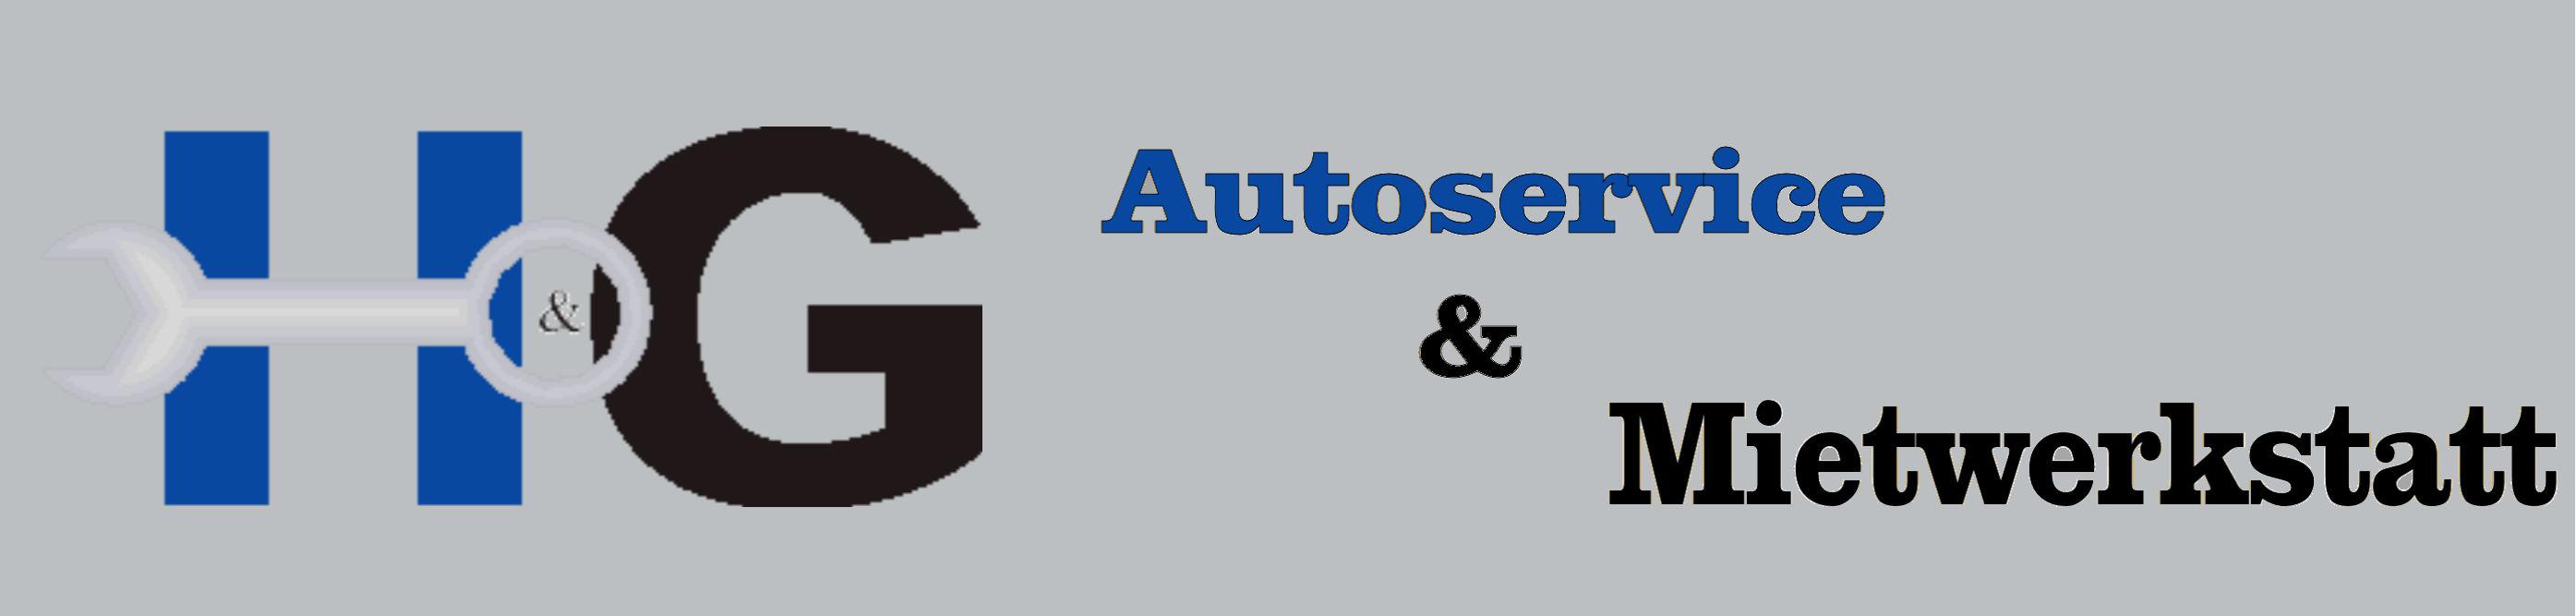 logo test4